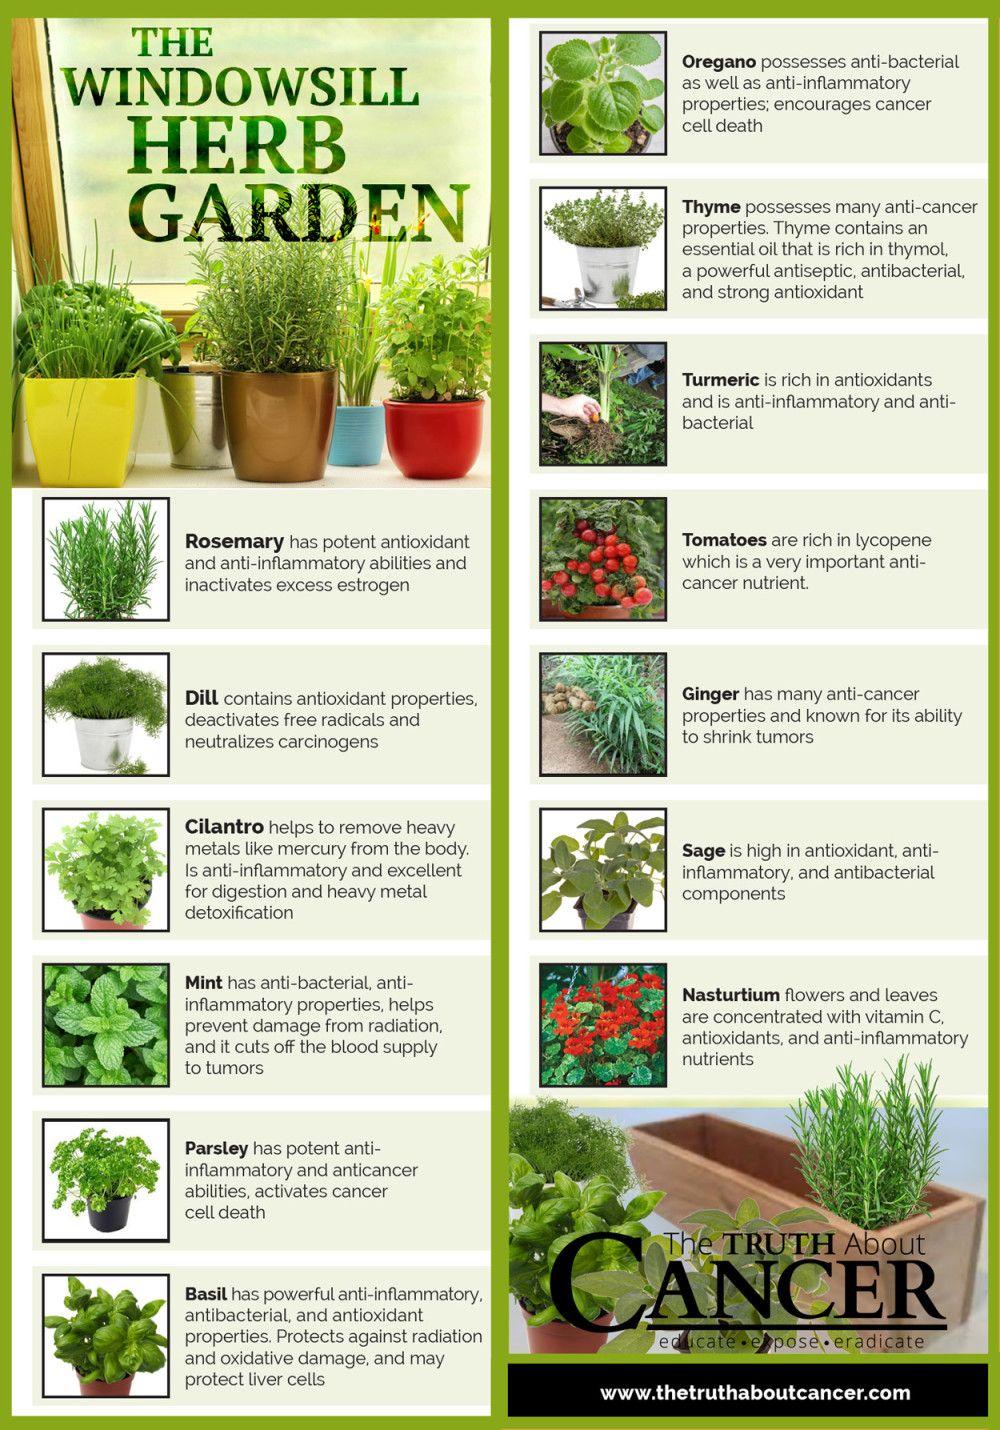 14 cancer fighting plants for your indoor herb garden gardens